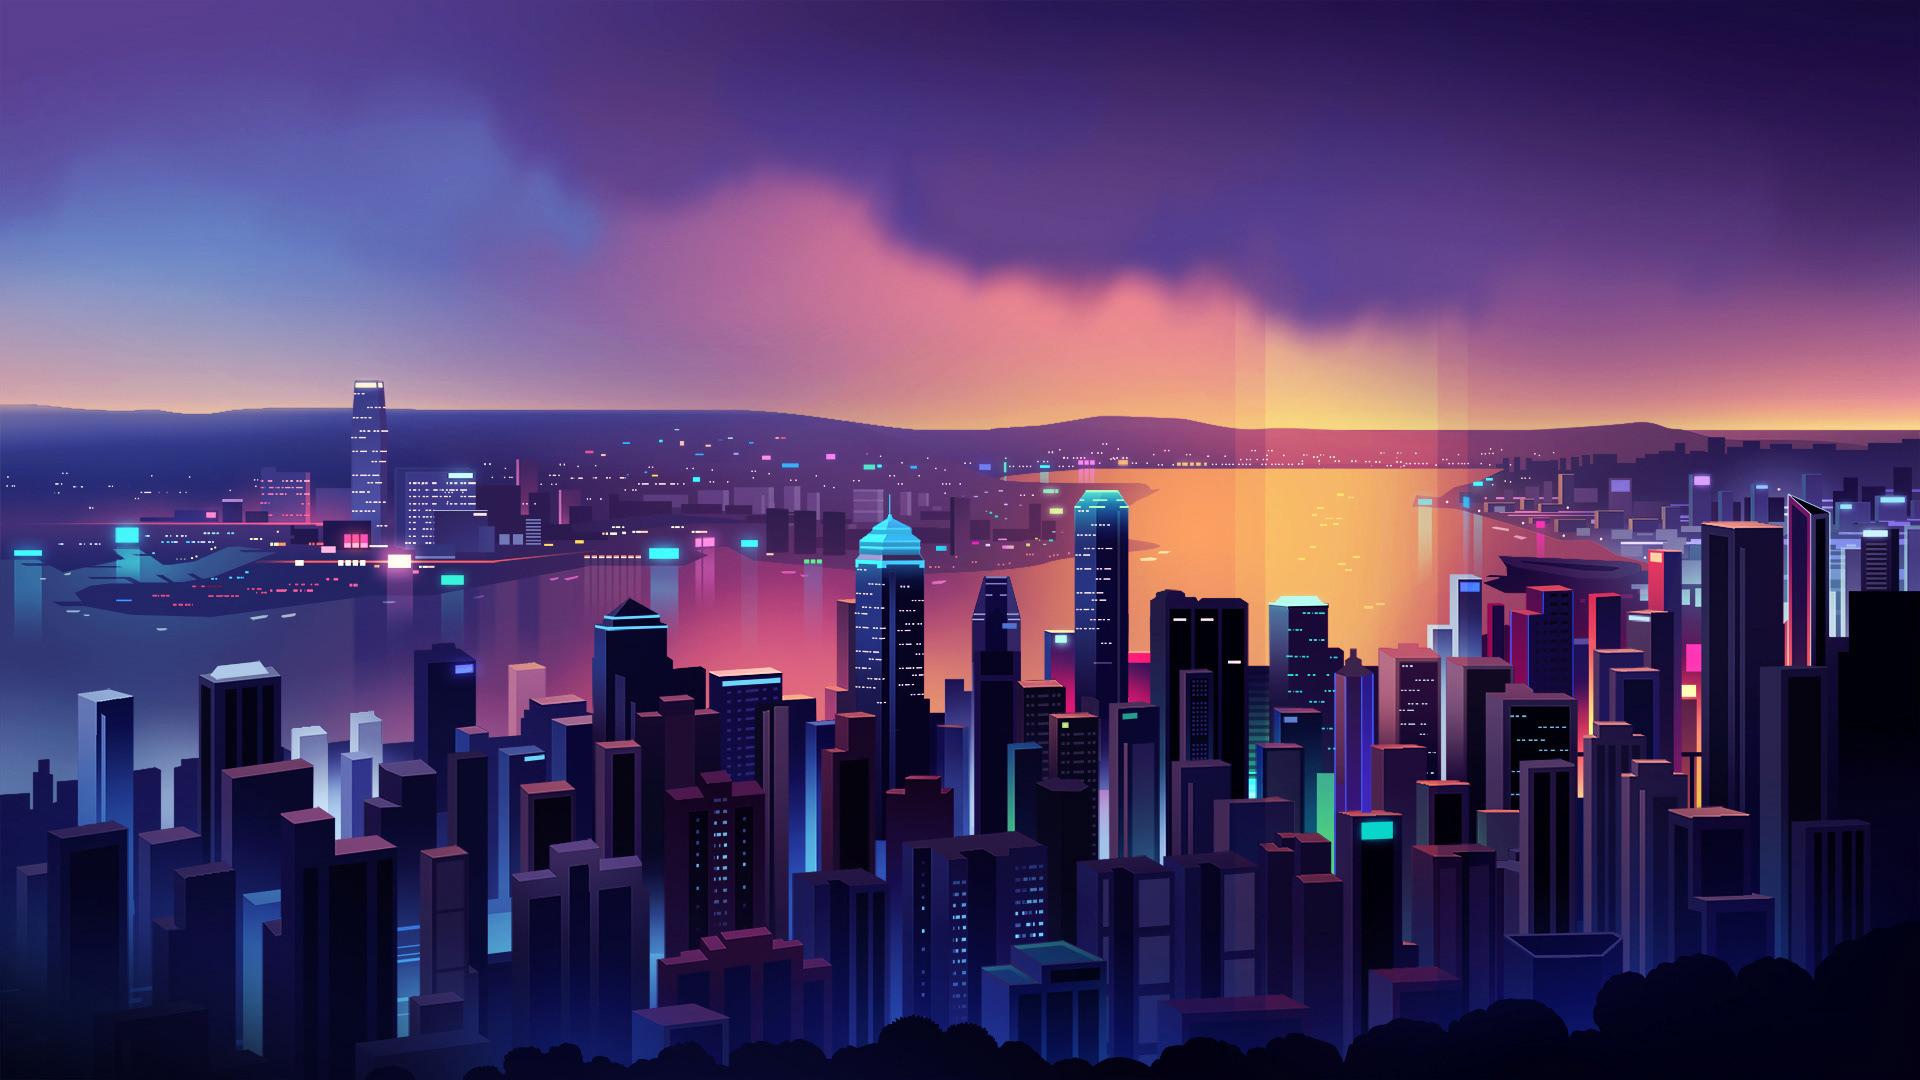 Neon Hong Kong Skyline (by Romain Trystram) [1920x1080]